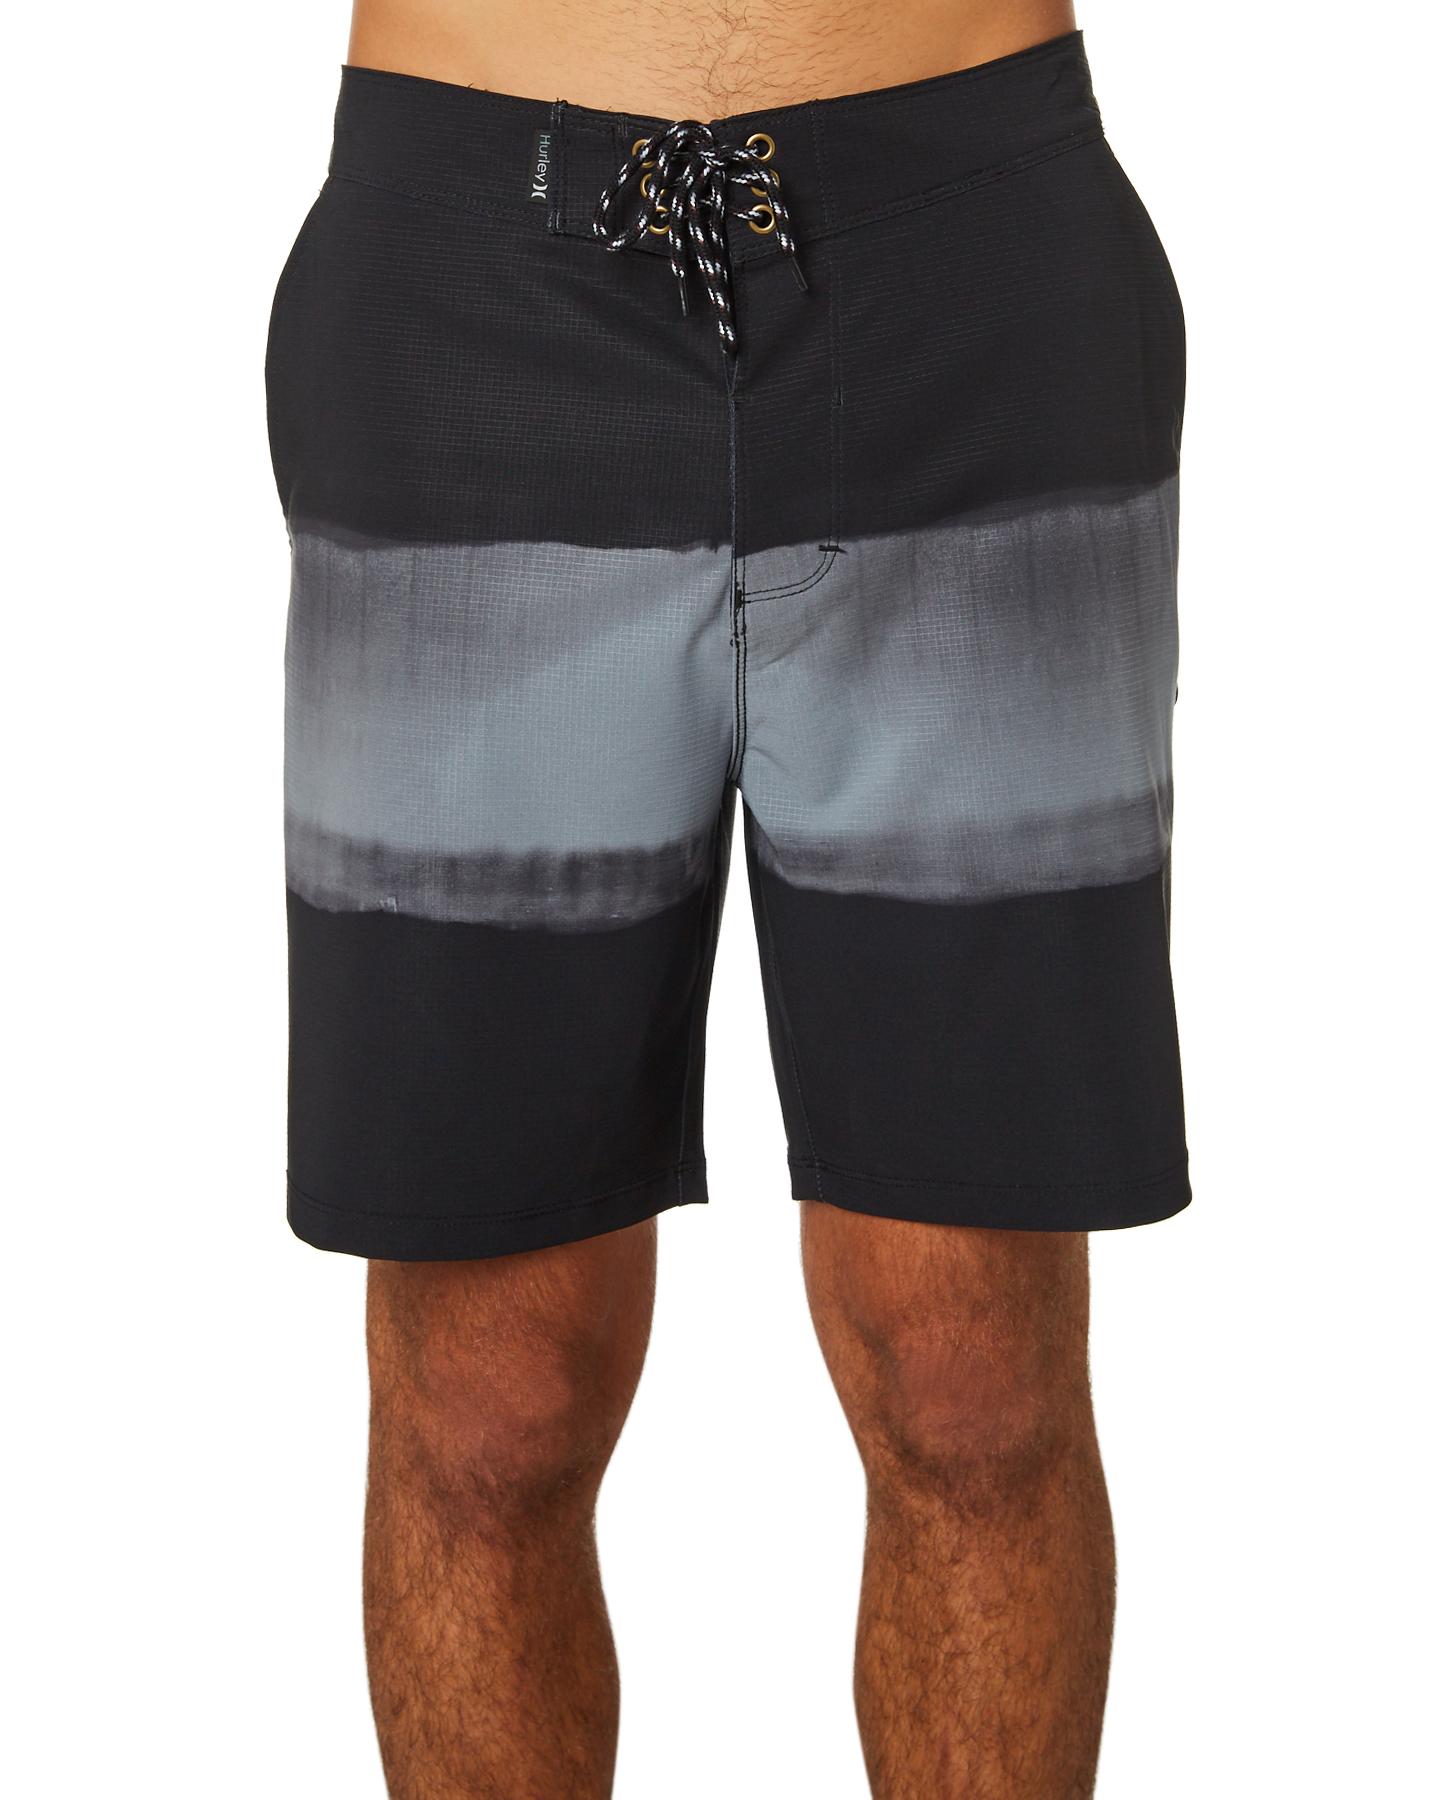 5b54c0e3aa Hurley Phantom Pigment Beachside Mens Boardshort - Black | SurfStitch